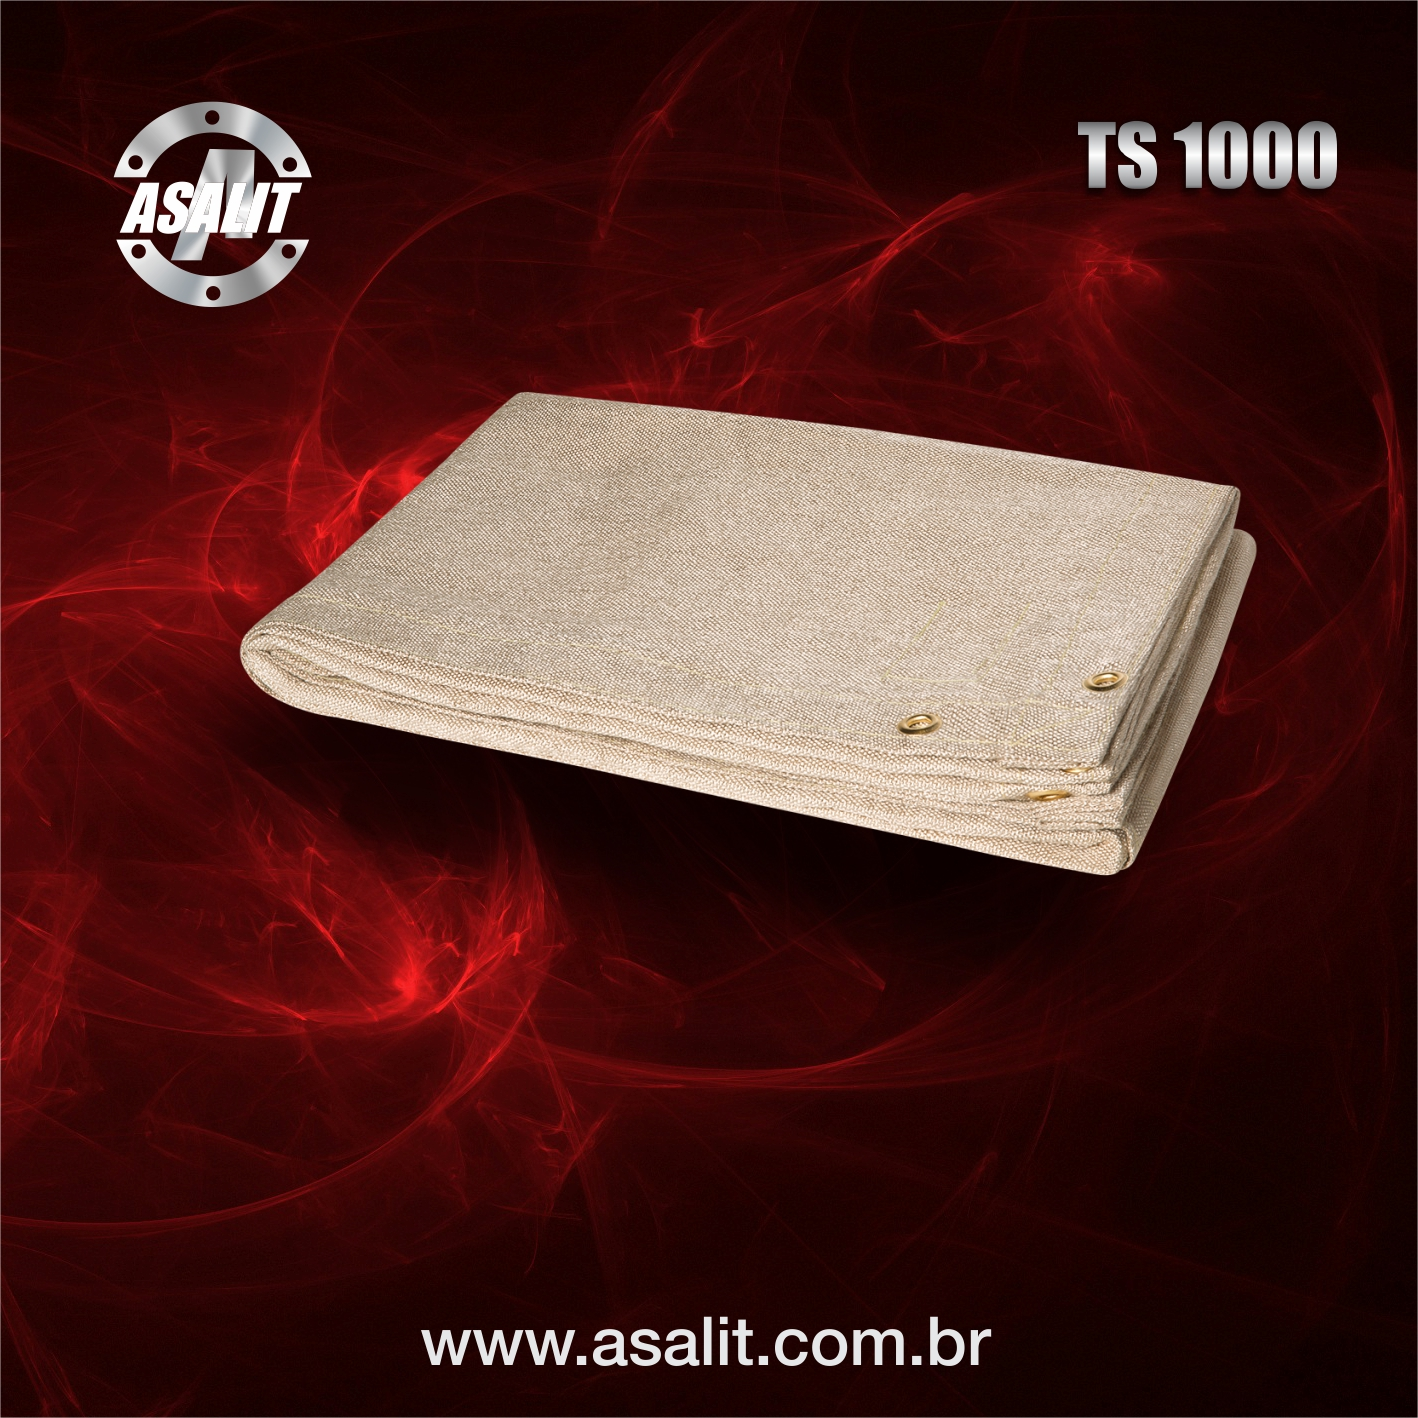 Cortina refratária TS1000